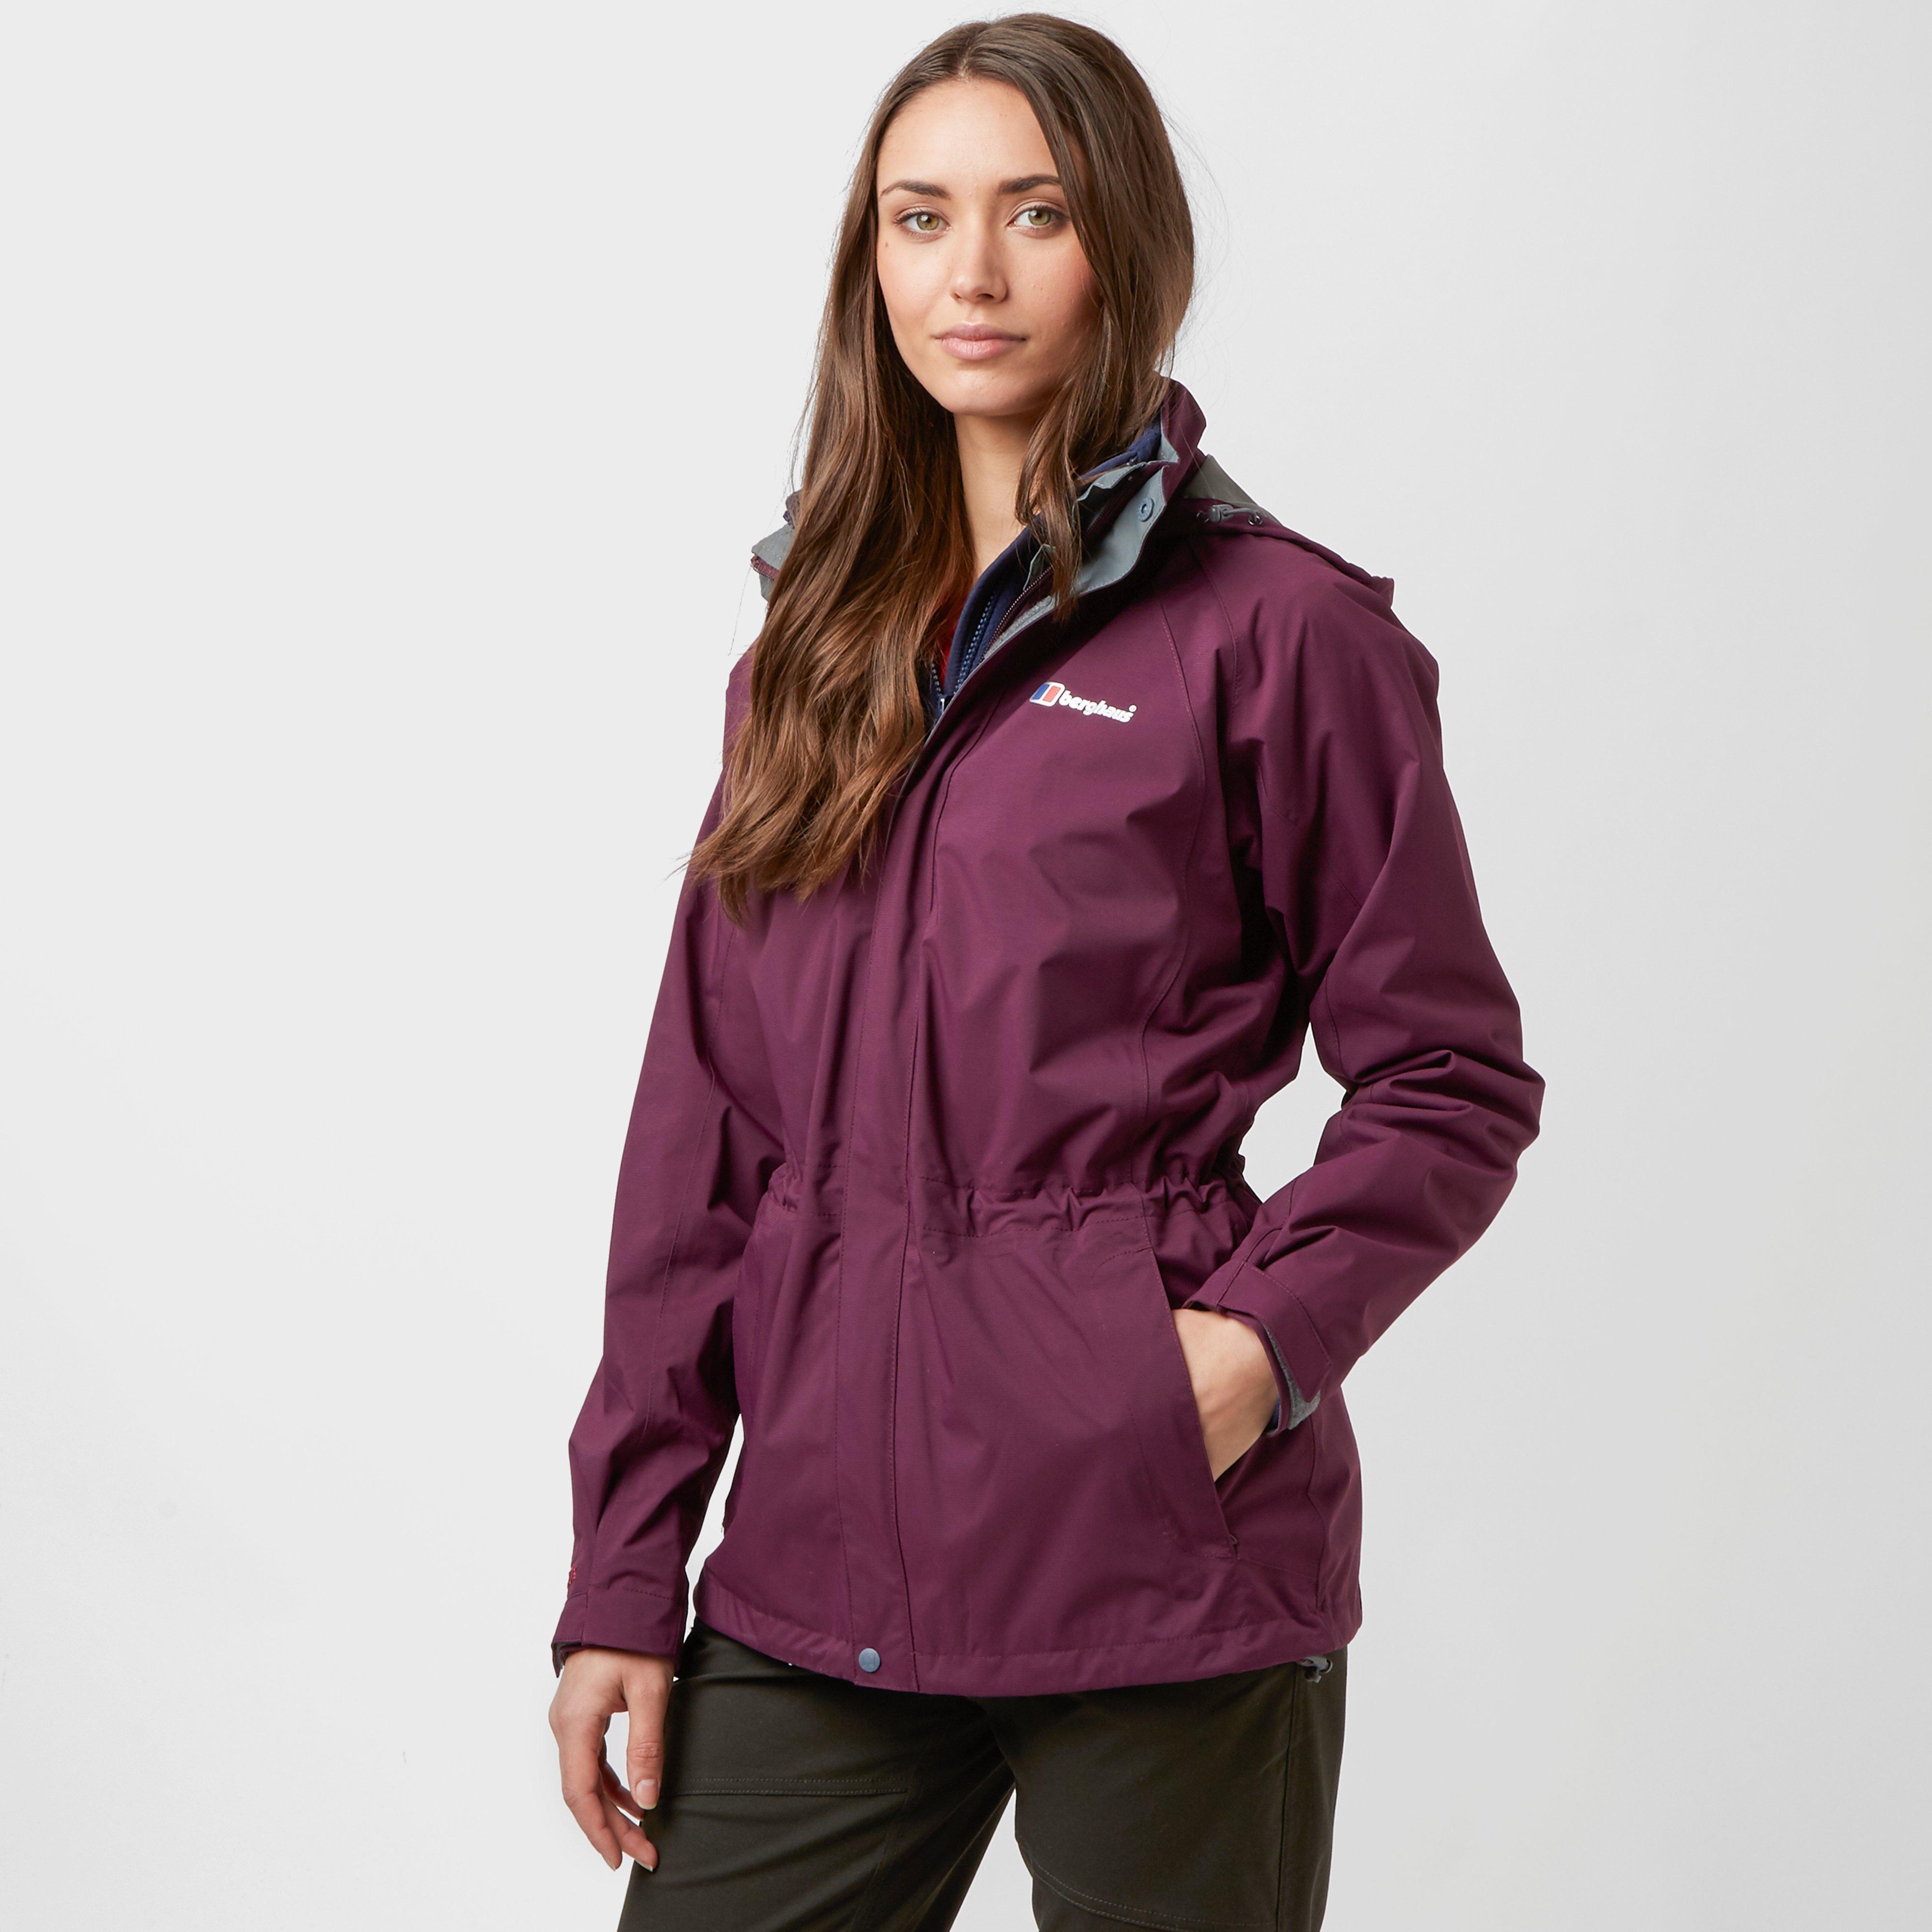 Berghaus womens waterproof jackets